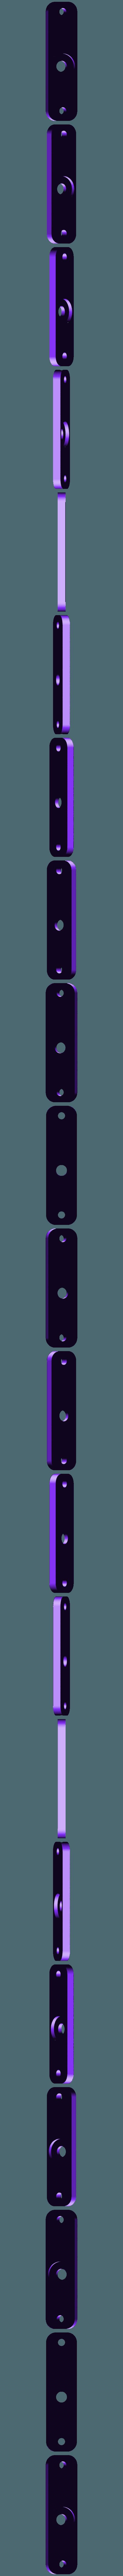 geared_extruder_teflon_clip_holder_part2.stl Download free STL file FDM Printer de Kleine Reus 300x300x900 • 3D printable object, Job